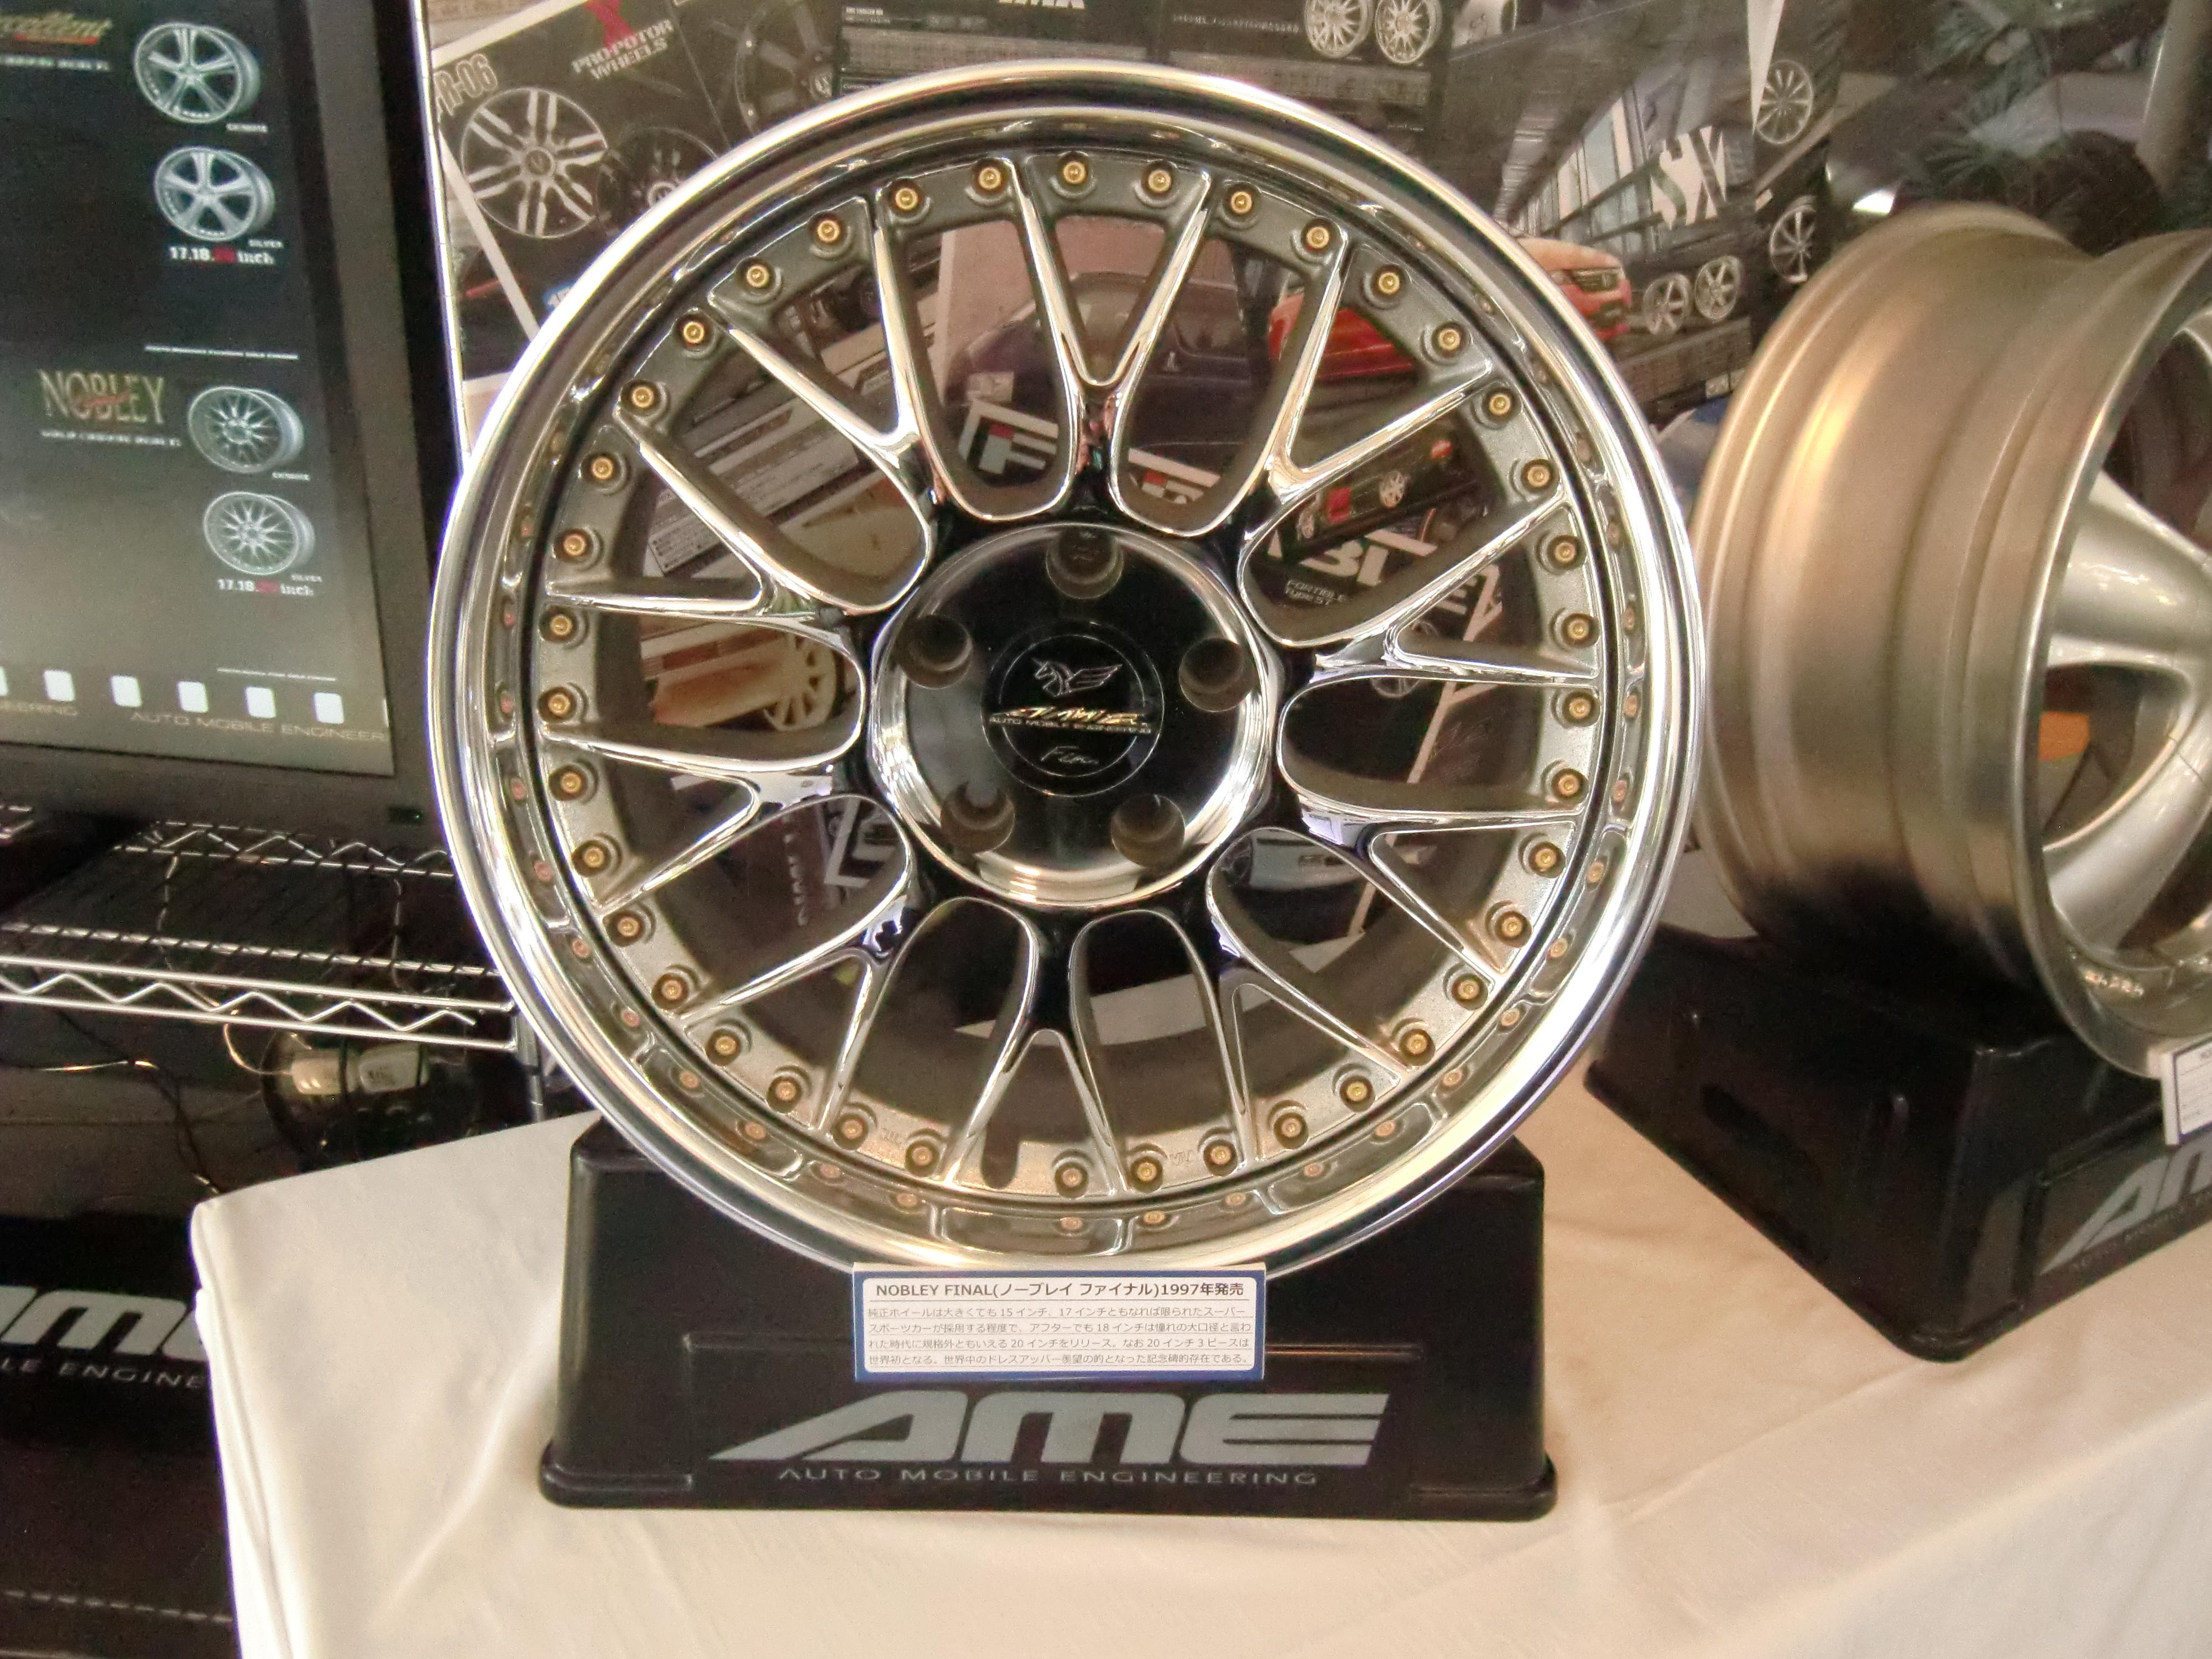 2019 KYOHO SHOW-DAN KAI - CAR SHOW, AME Wheels, AME Wheel, AME, TRACER TM-02, SHALLEN, TRACER GT-V